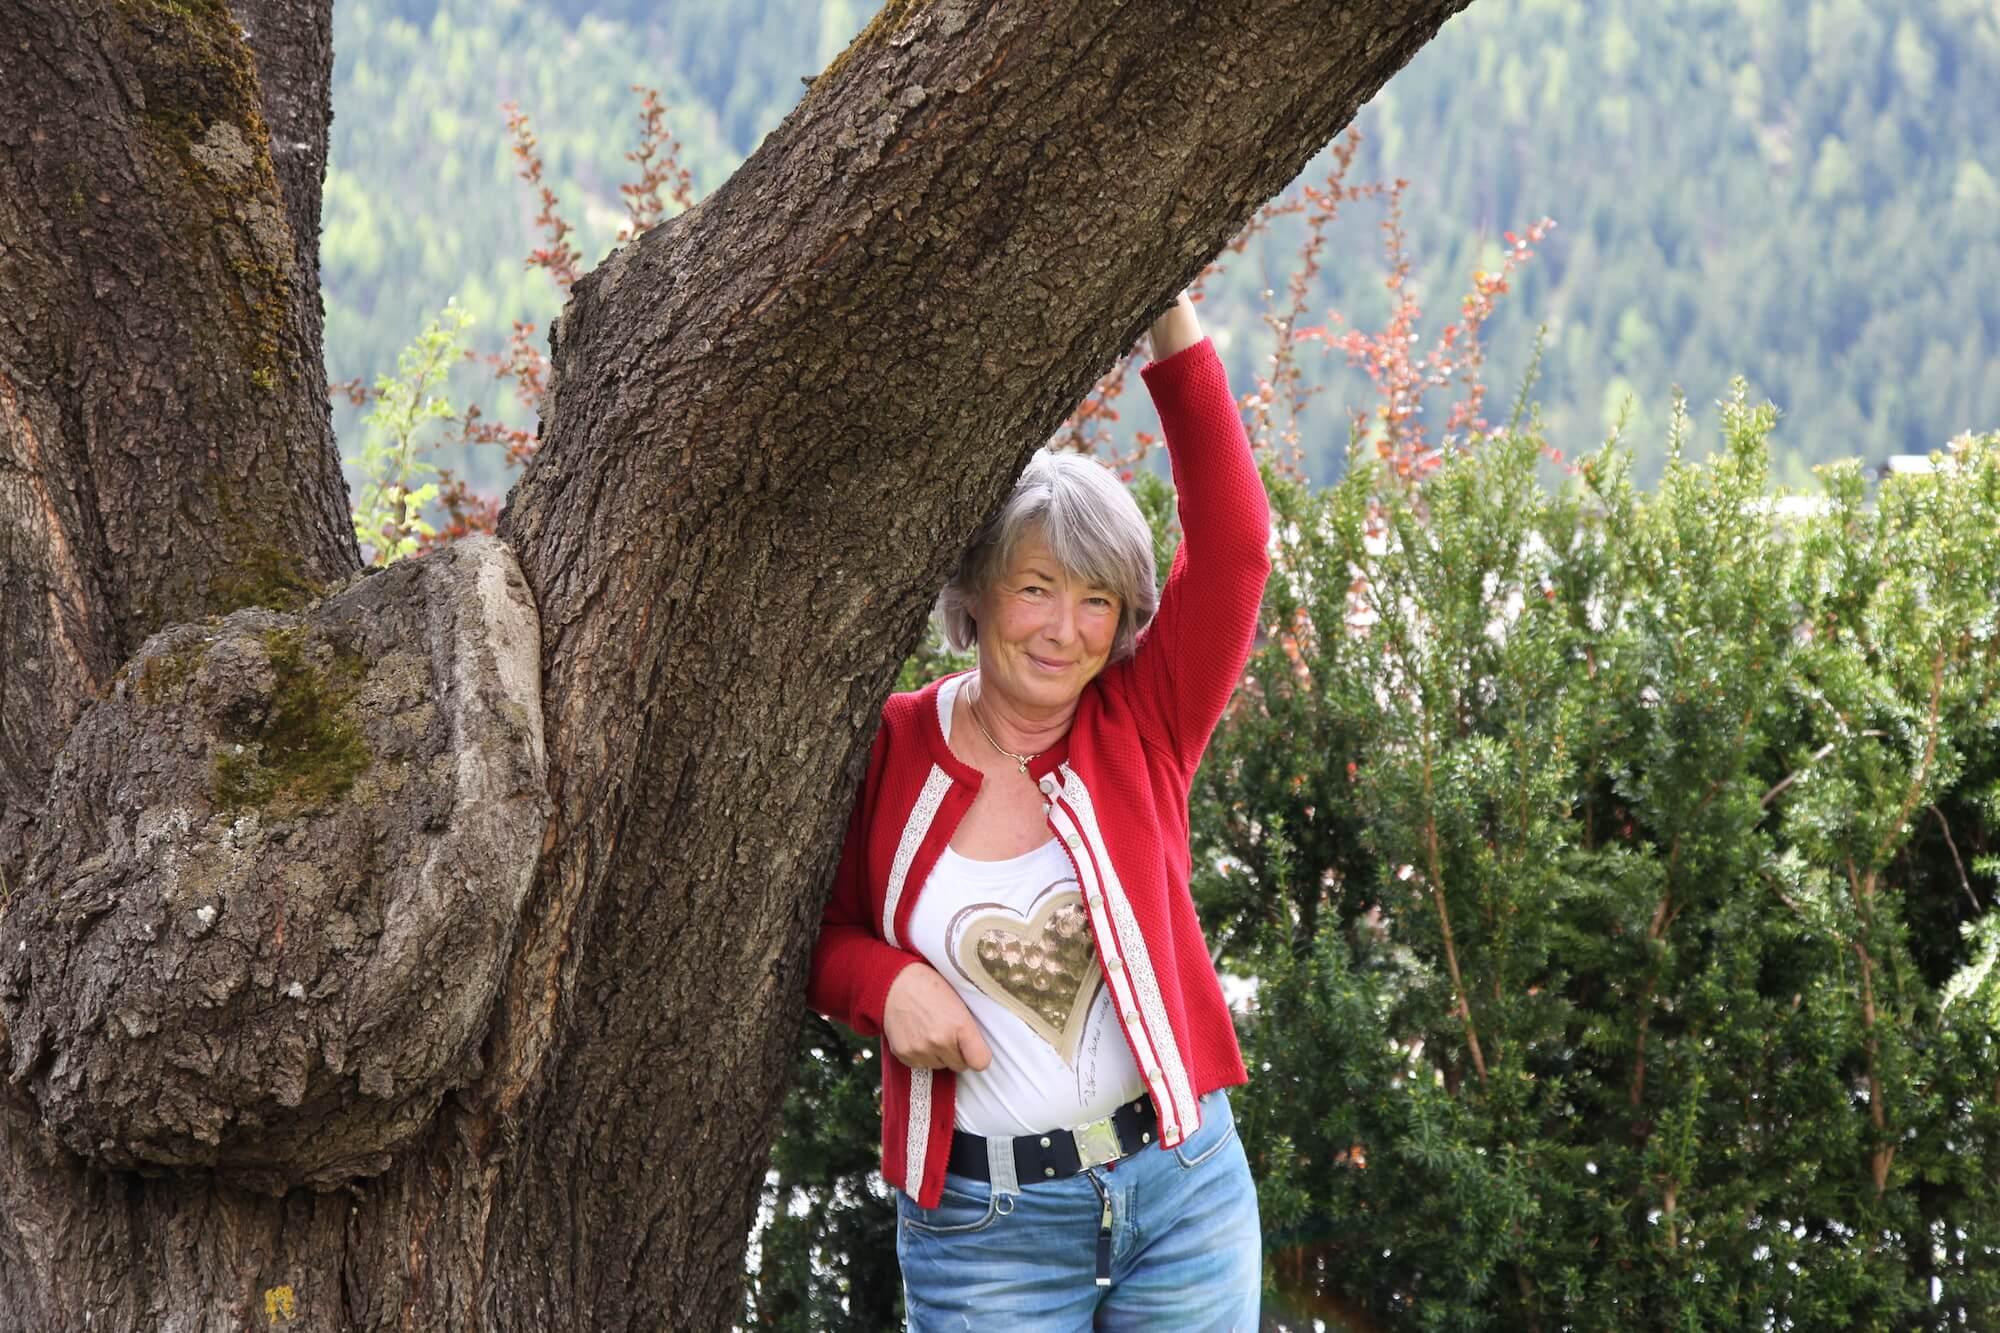 Naturschamane_Feng_Shui_Samanische_Seminare_Spirituelles_Coaching_Essenzen_Meditationen_Vasnaro_20.jpg